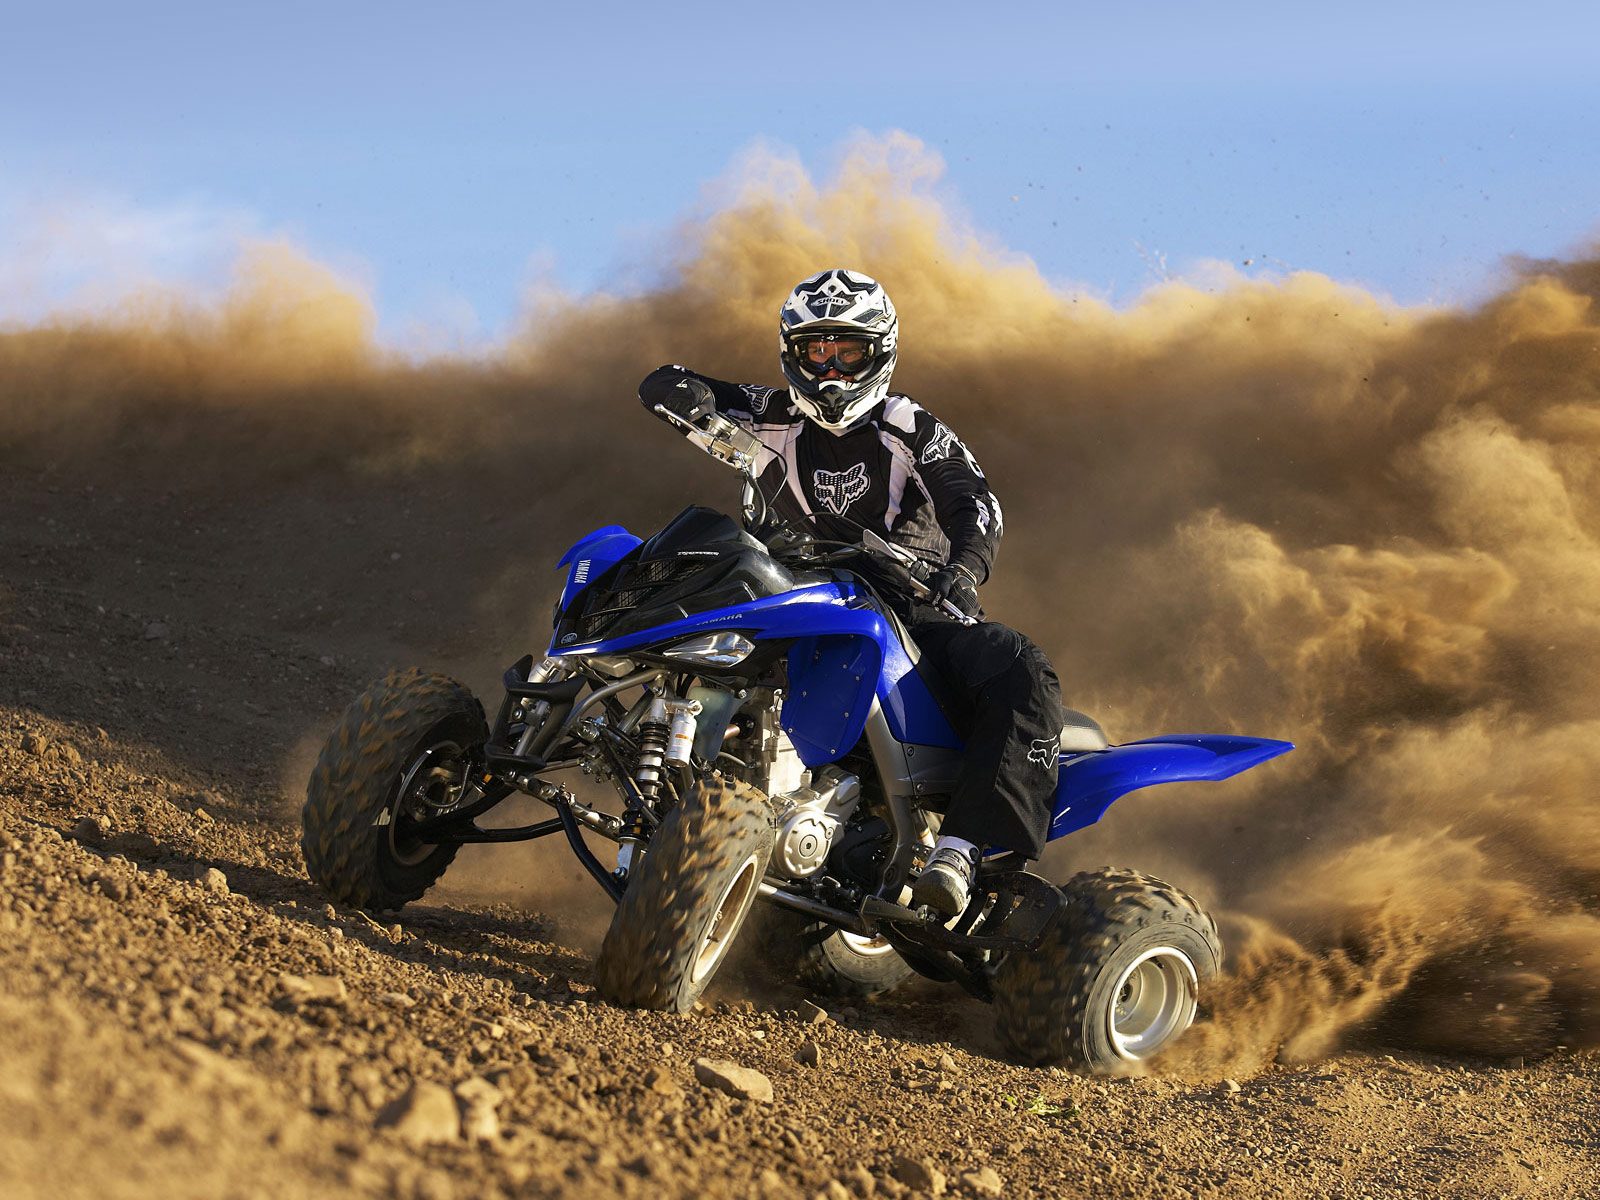 YAMAHA RAPTOR atv quad offroad motorbike bike dirtbike g wallpaper 1600x1200